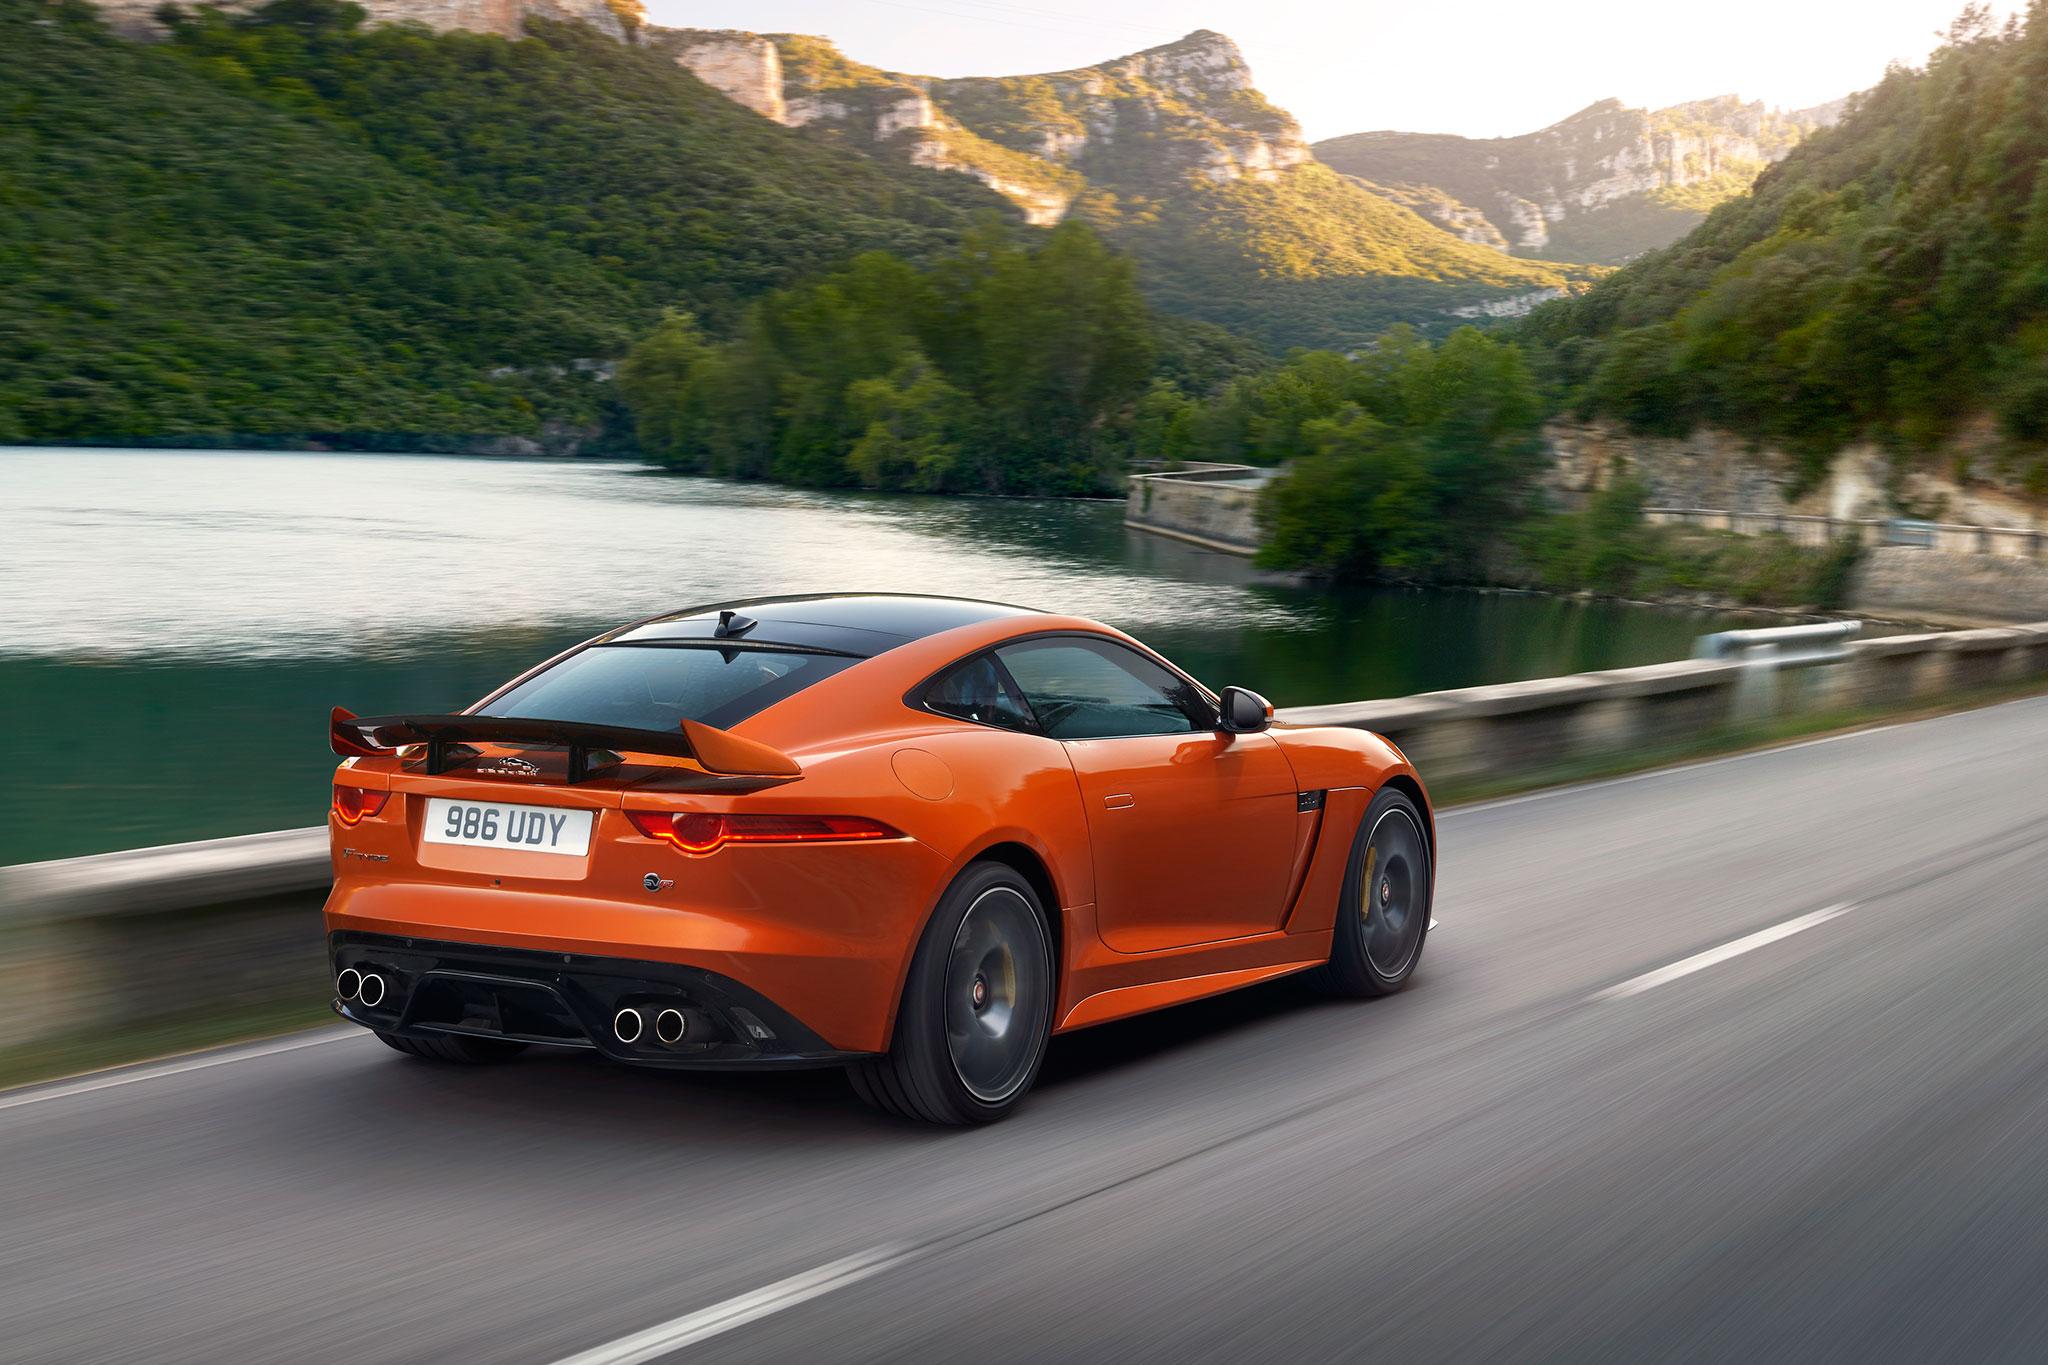 2017-jaguar-f-type-svr-rear-three-quarter-in-motion-01